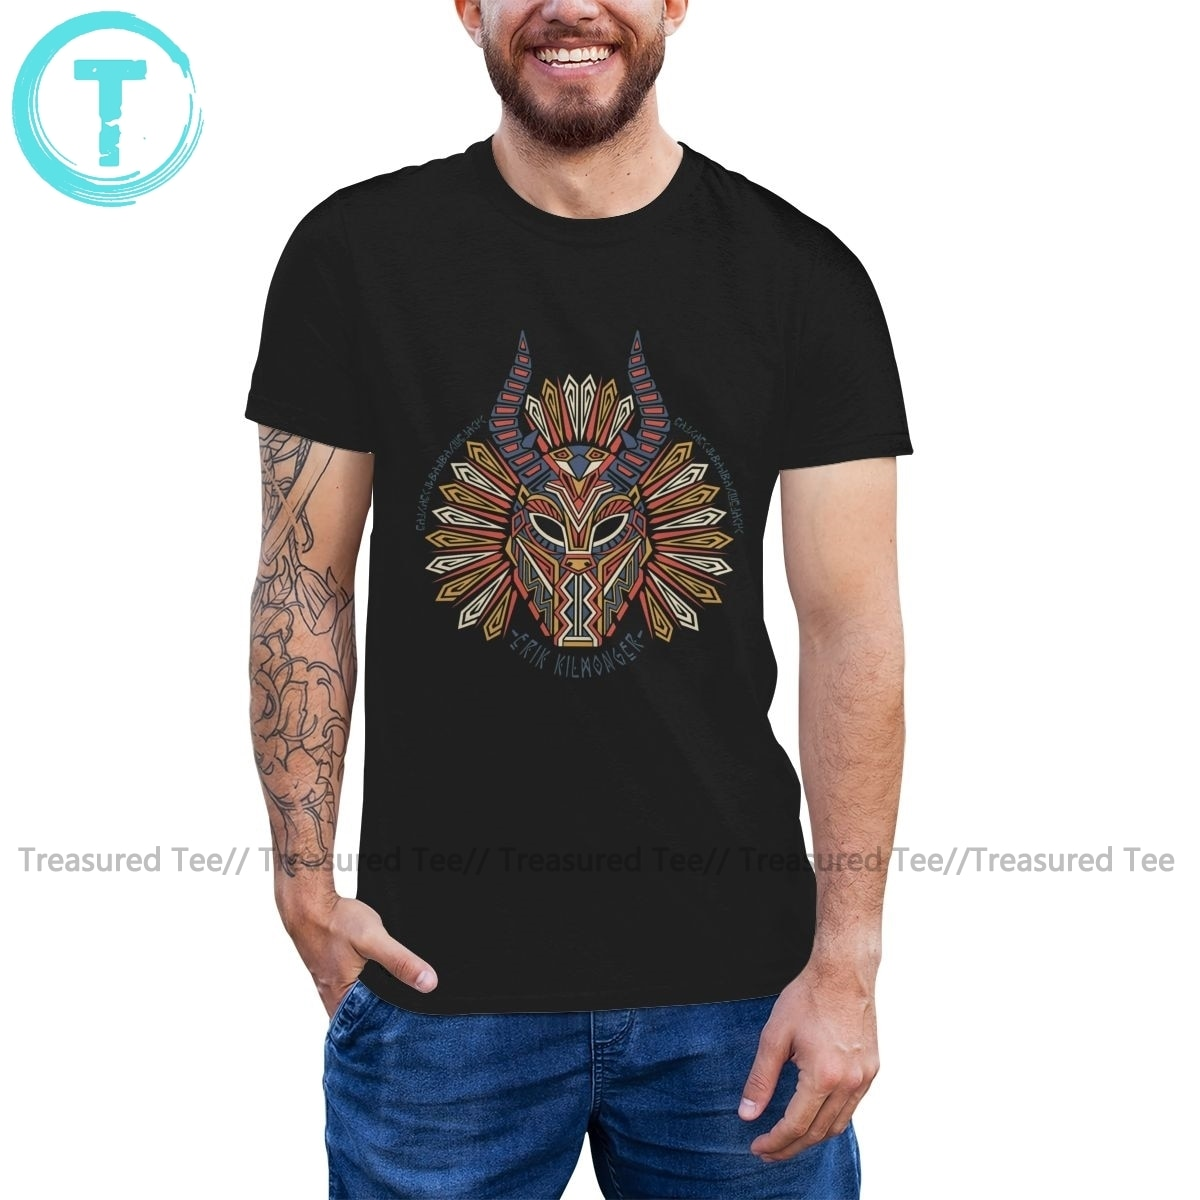 Camiseta Killmonger Black Panther merik Killmonger Tribal 6xl imprimir camiseta hombres 100 algodón camiseta divertida